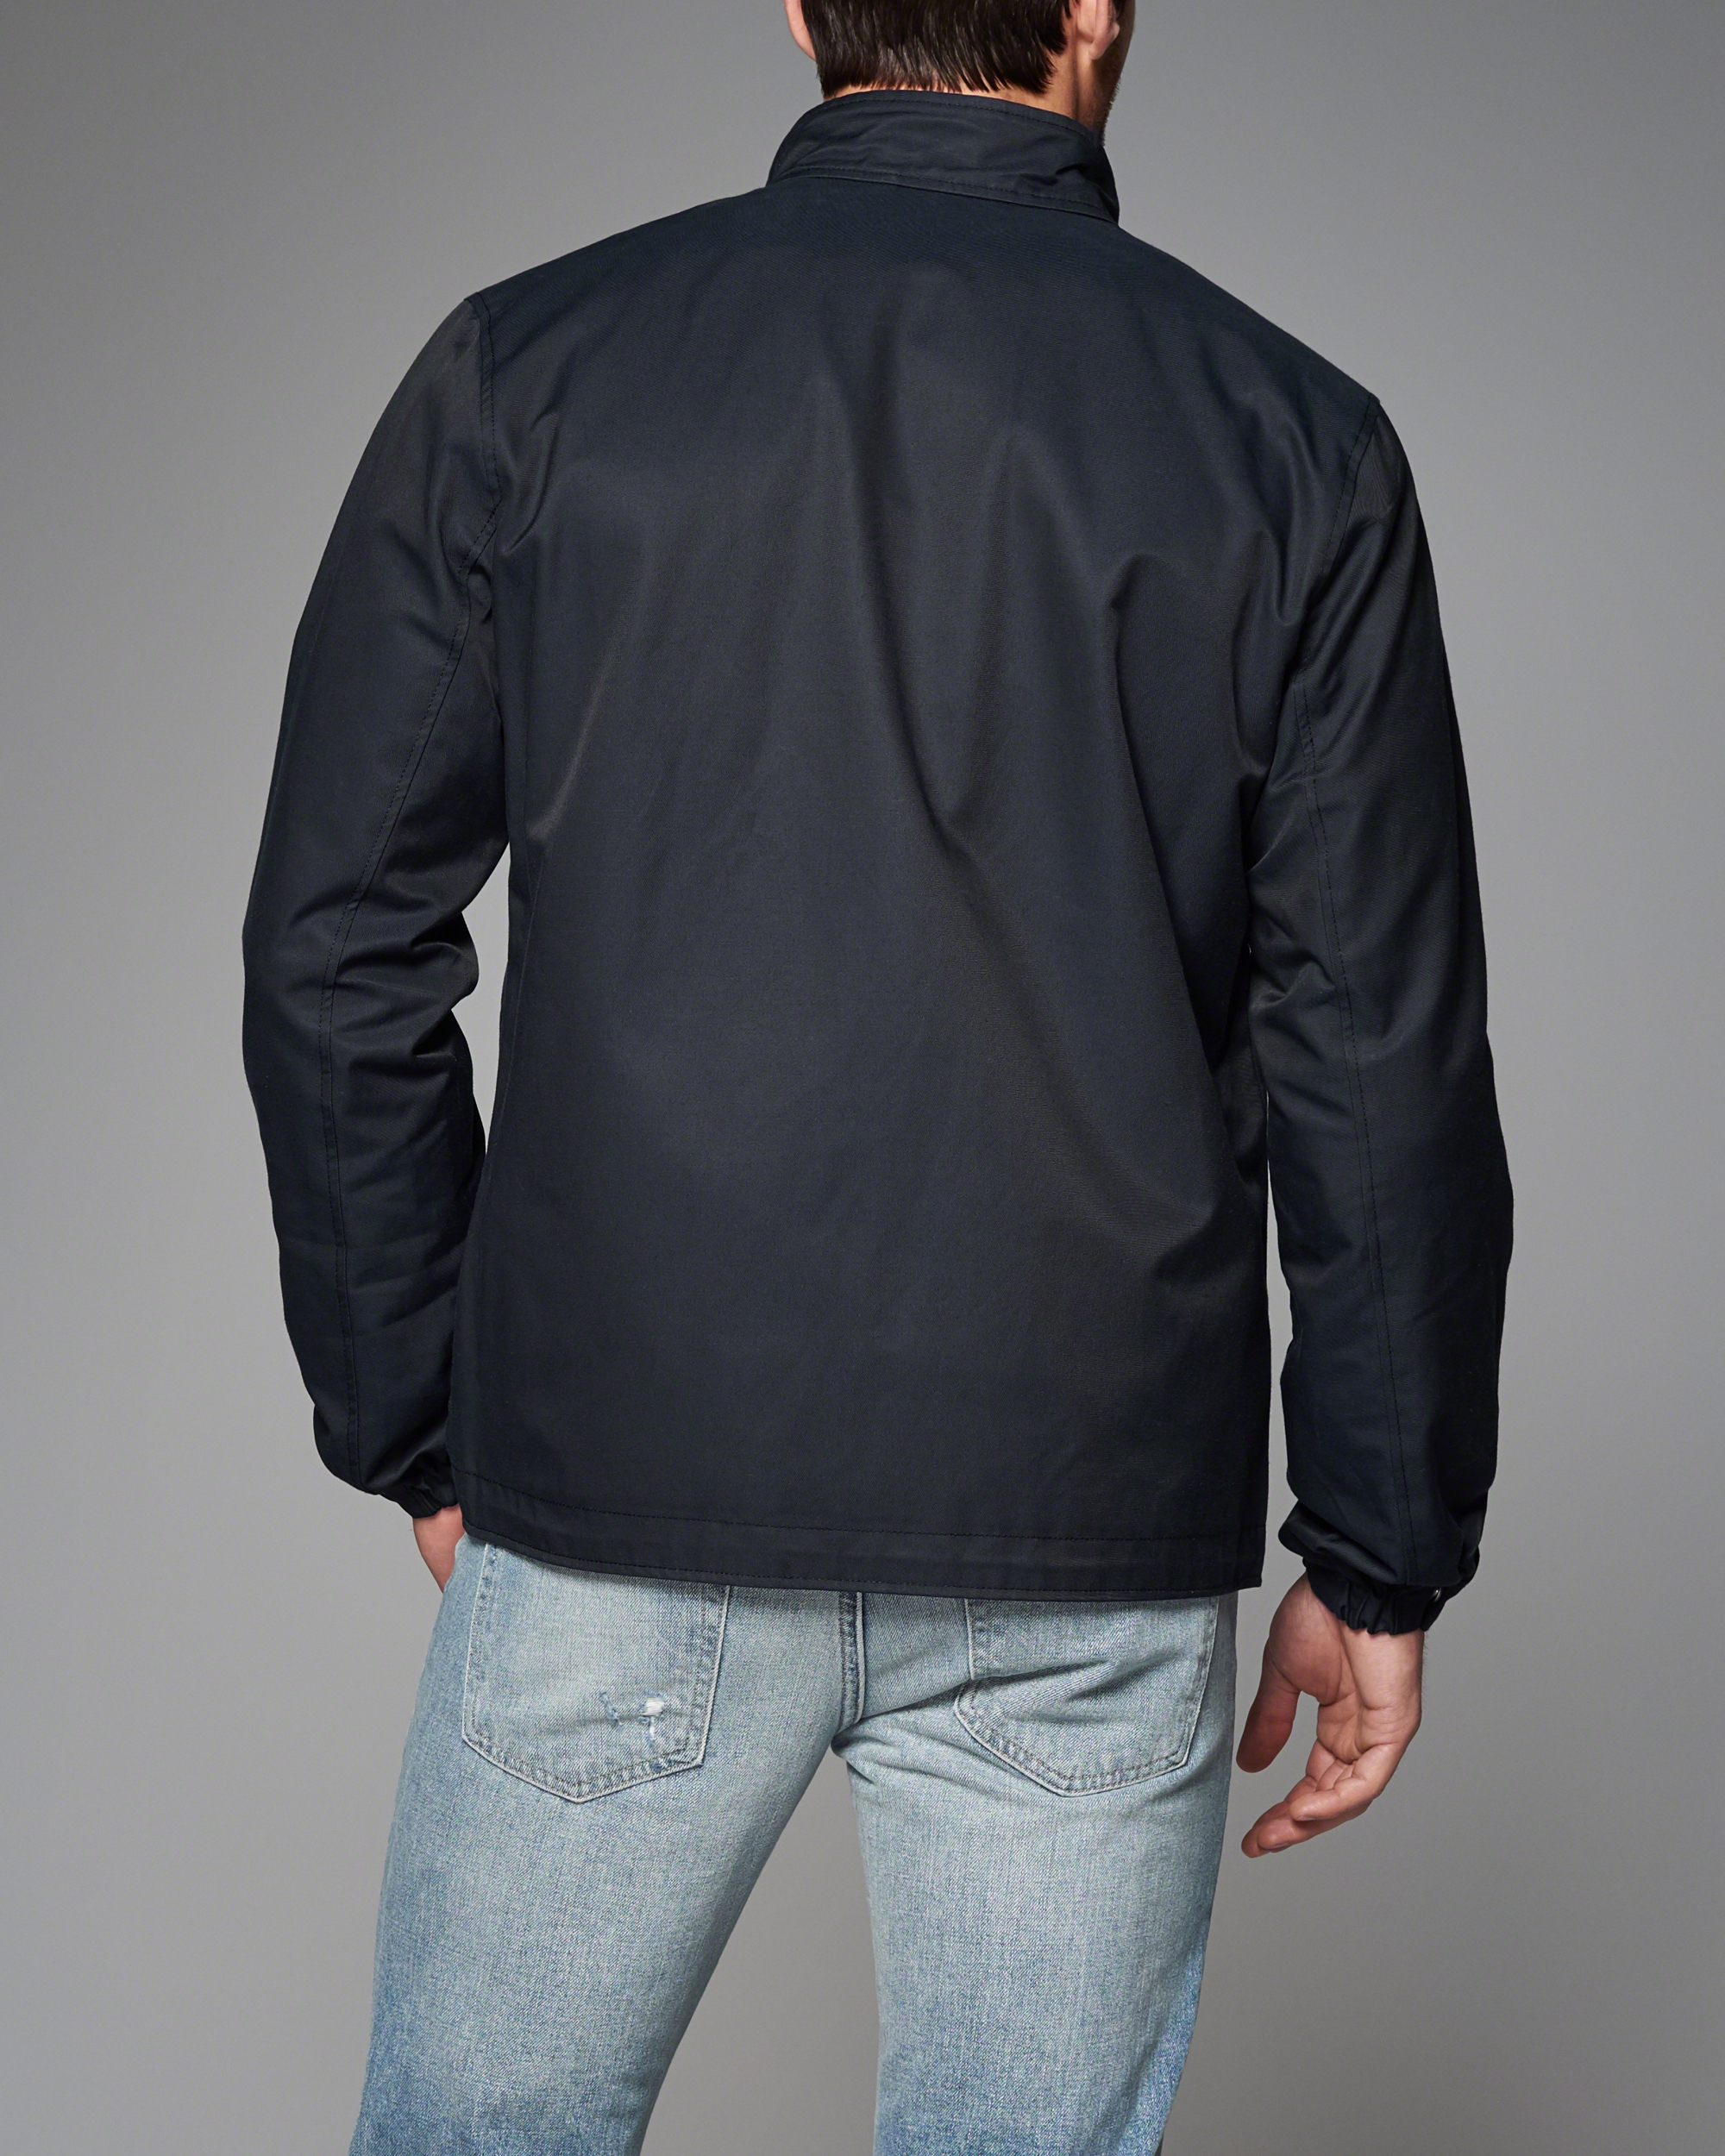 Abercrombie & Fitch Harrington Jacket In Black For Men